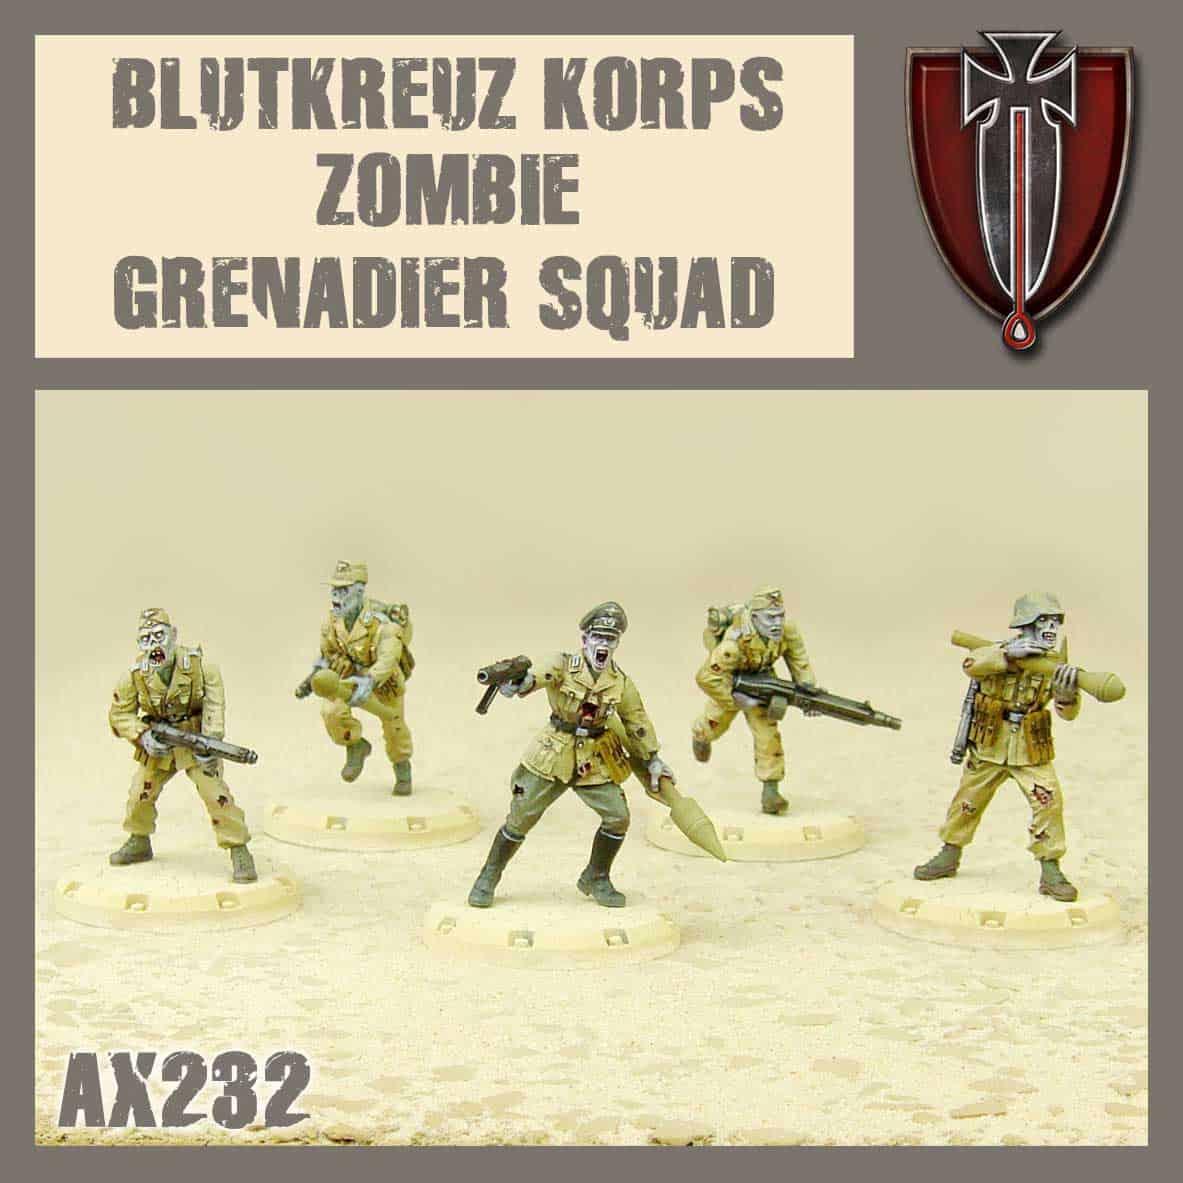 Blutkreuz Zombie Grenadiers Squad